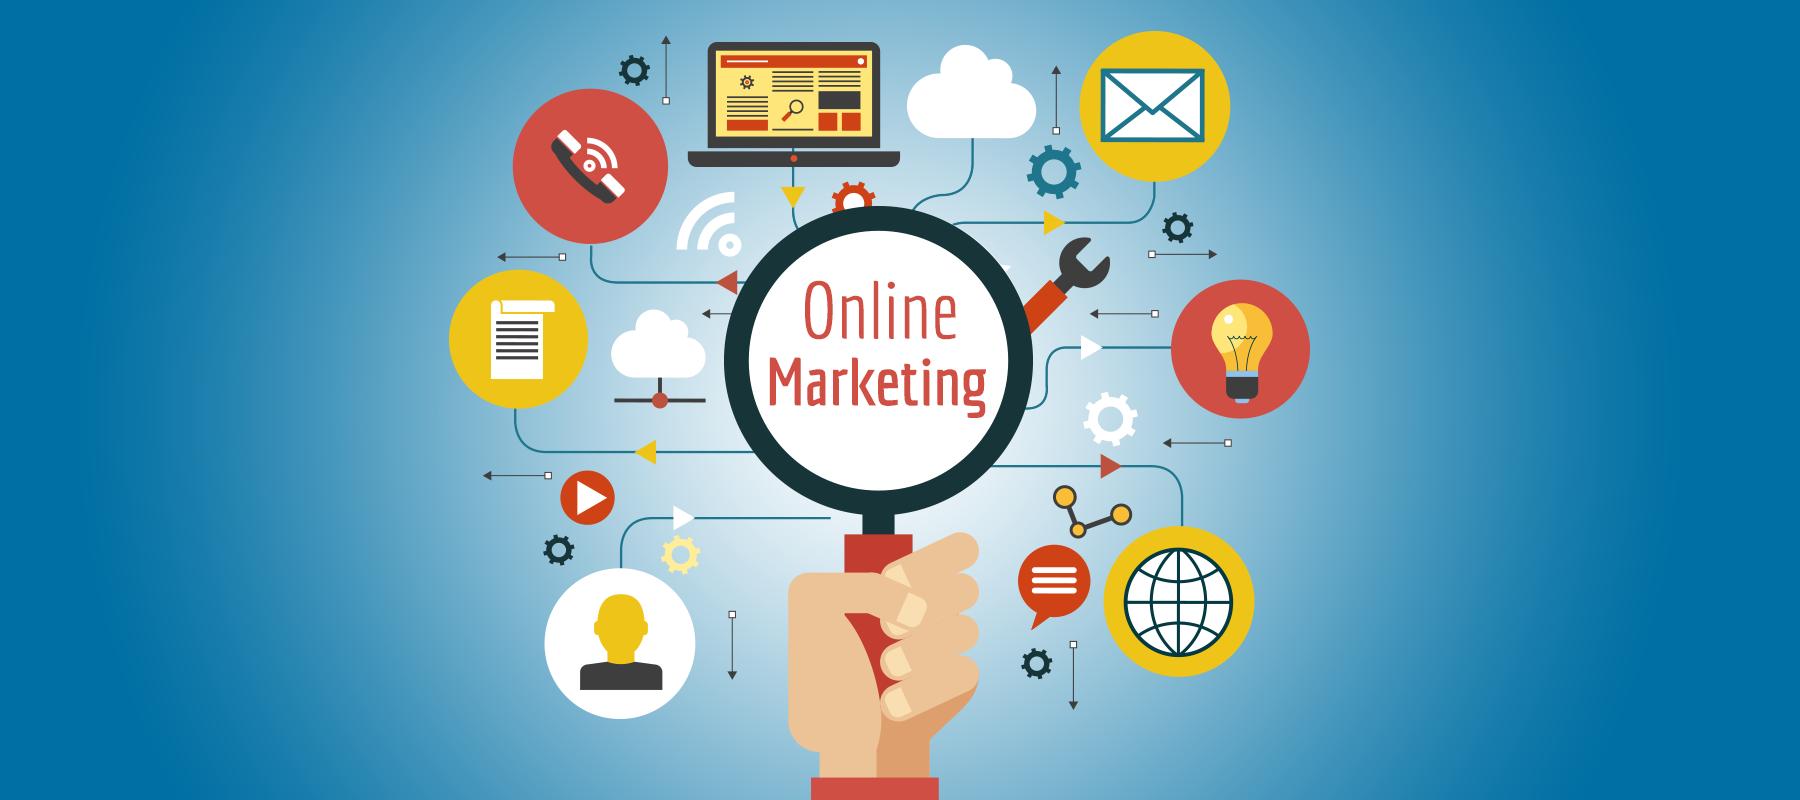 marketing-online-cho-doanh-nghiep-vua-va-nho